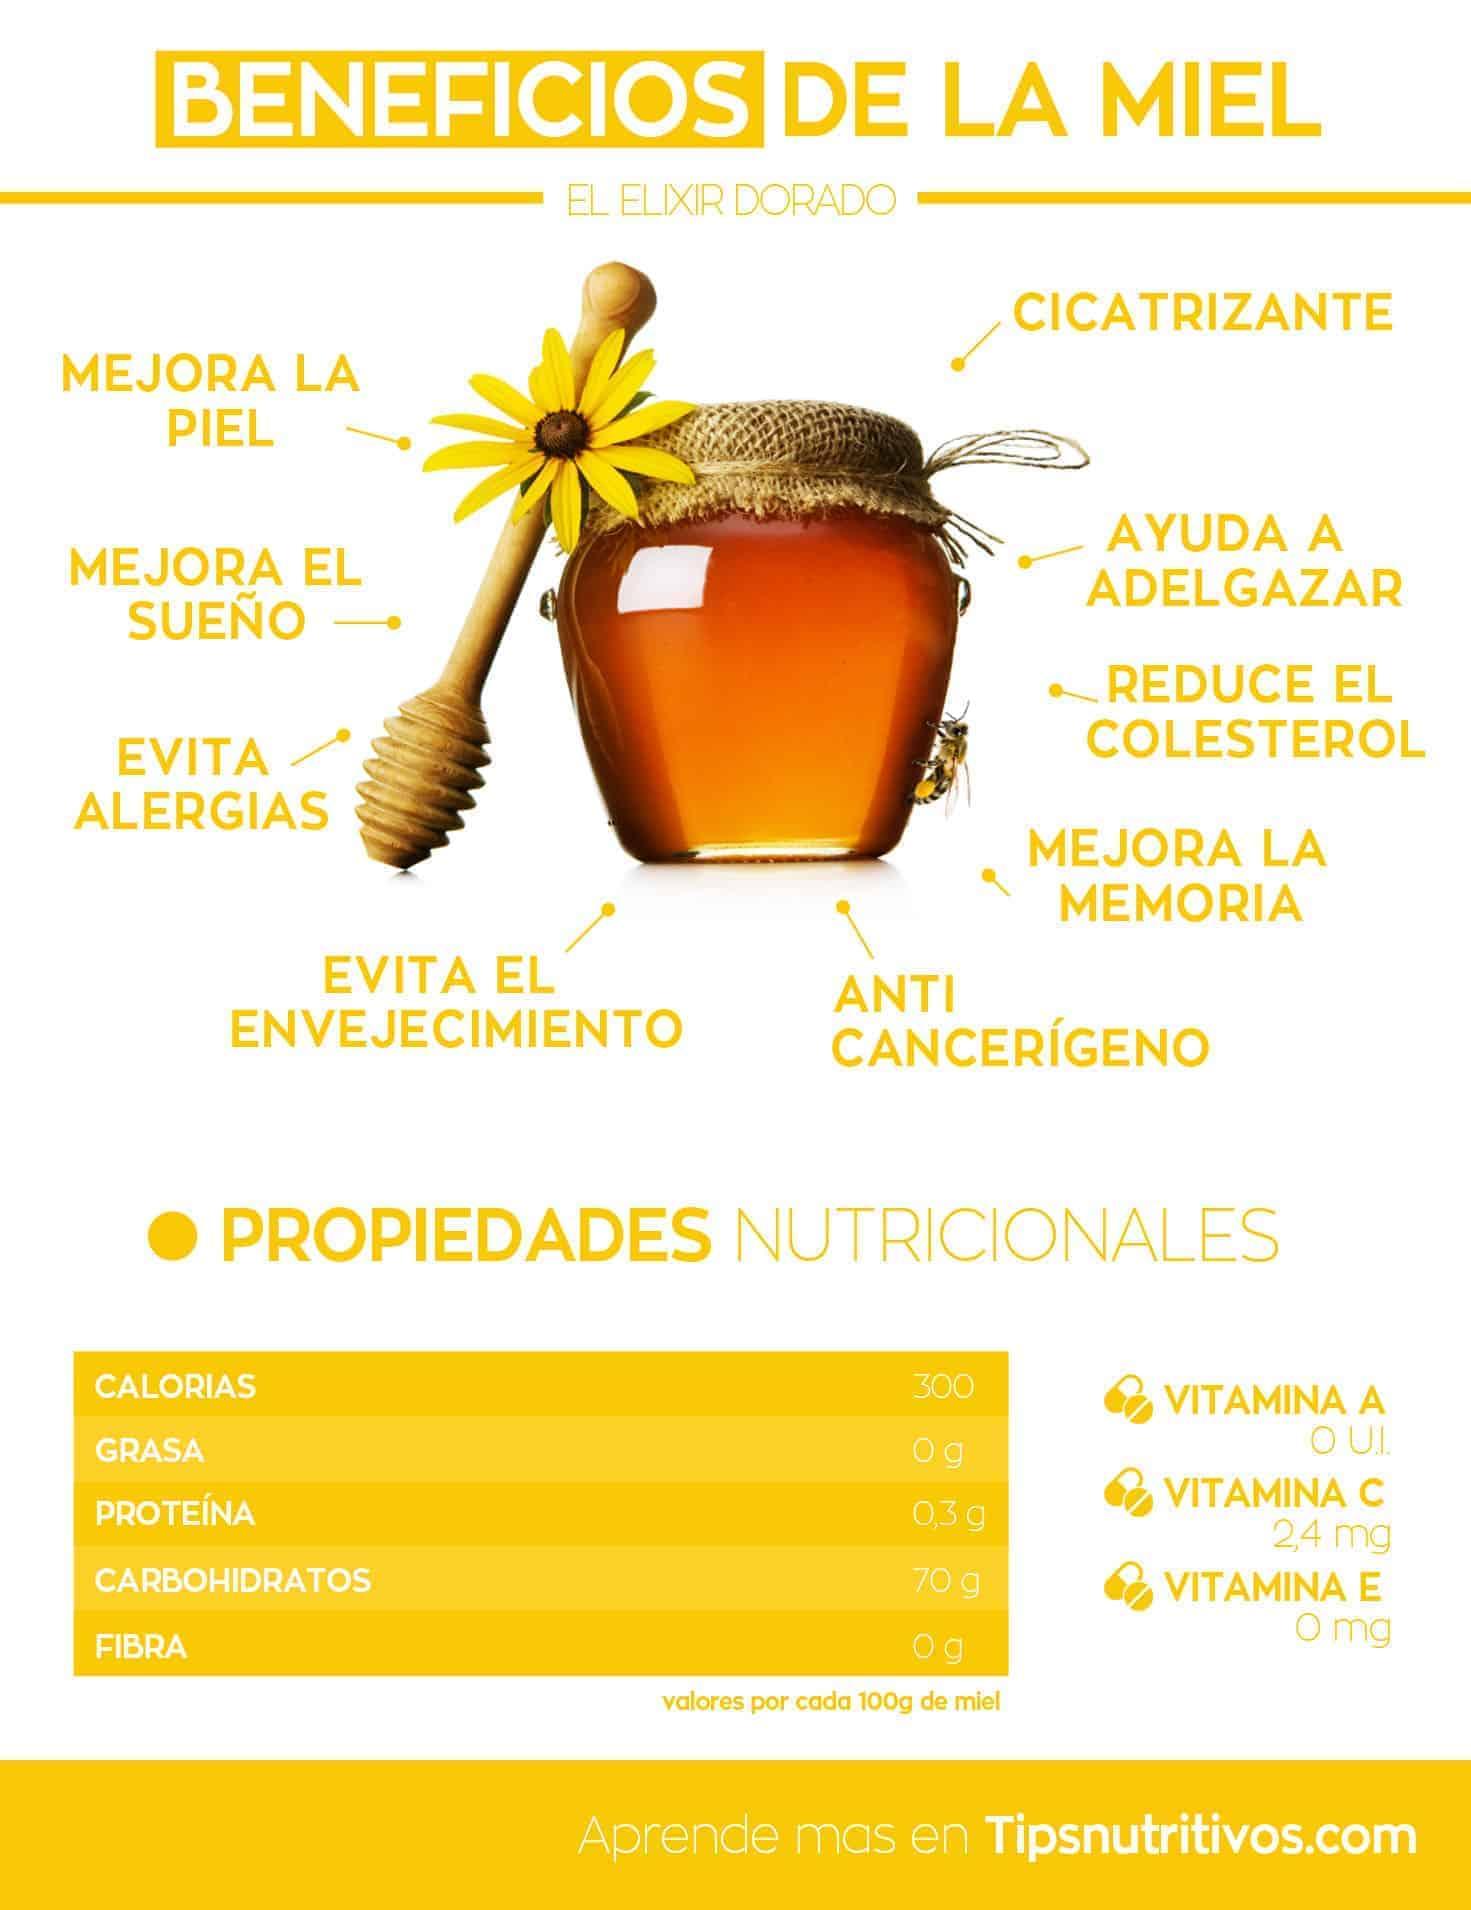 Infografia beneficios de la miel